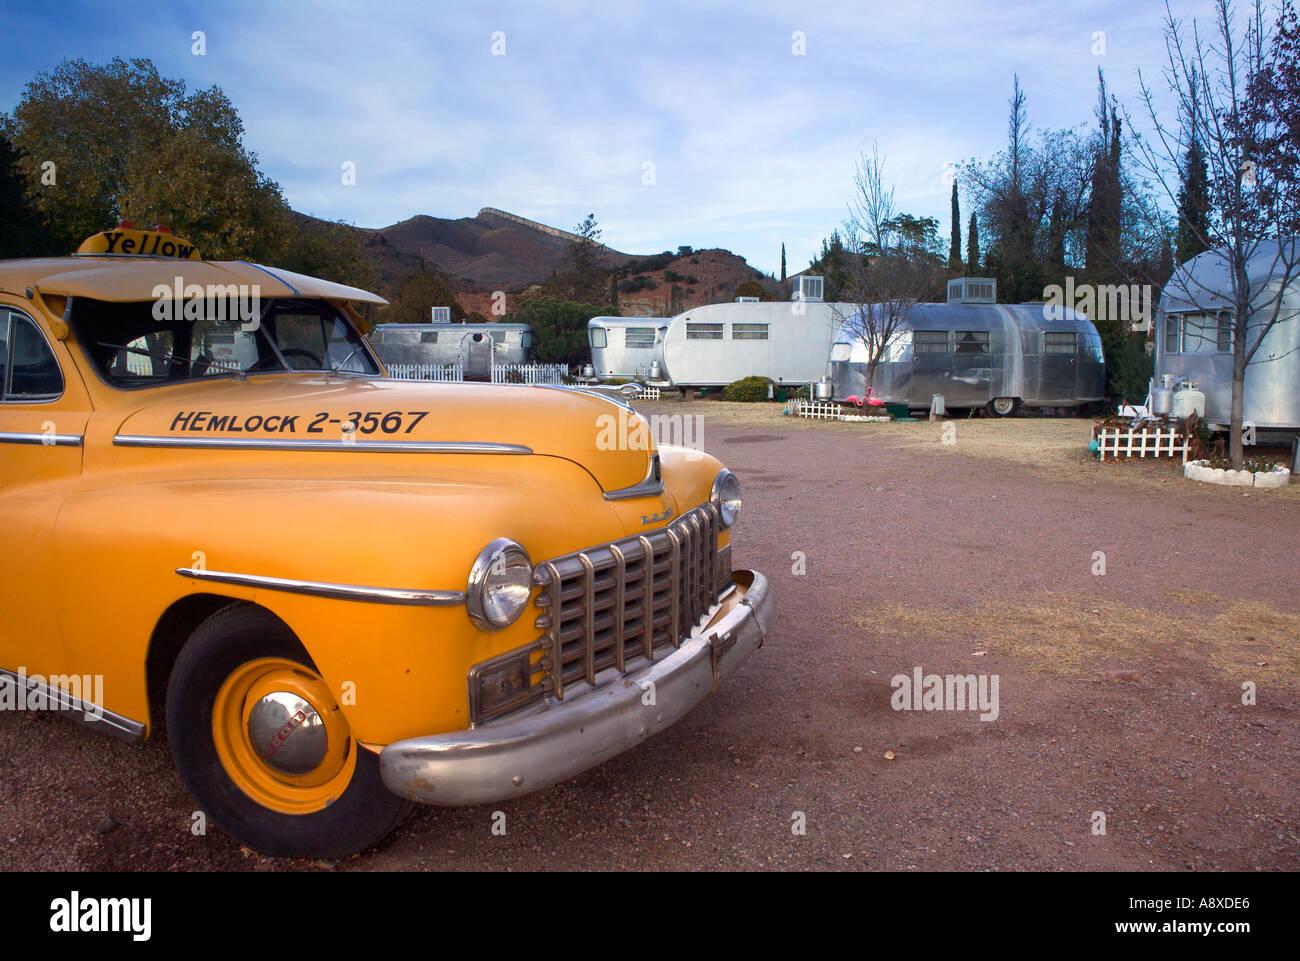 Oldtimer Anhänger Motel, Bisbee, Arizona, USA Stockbild